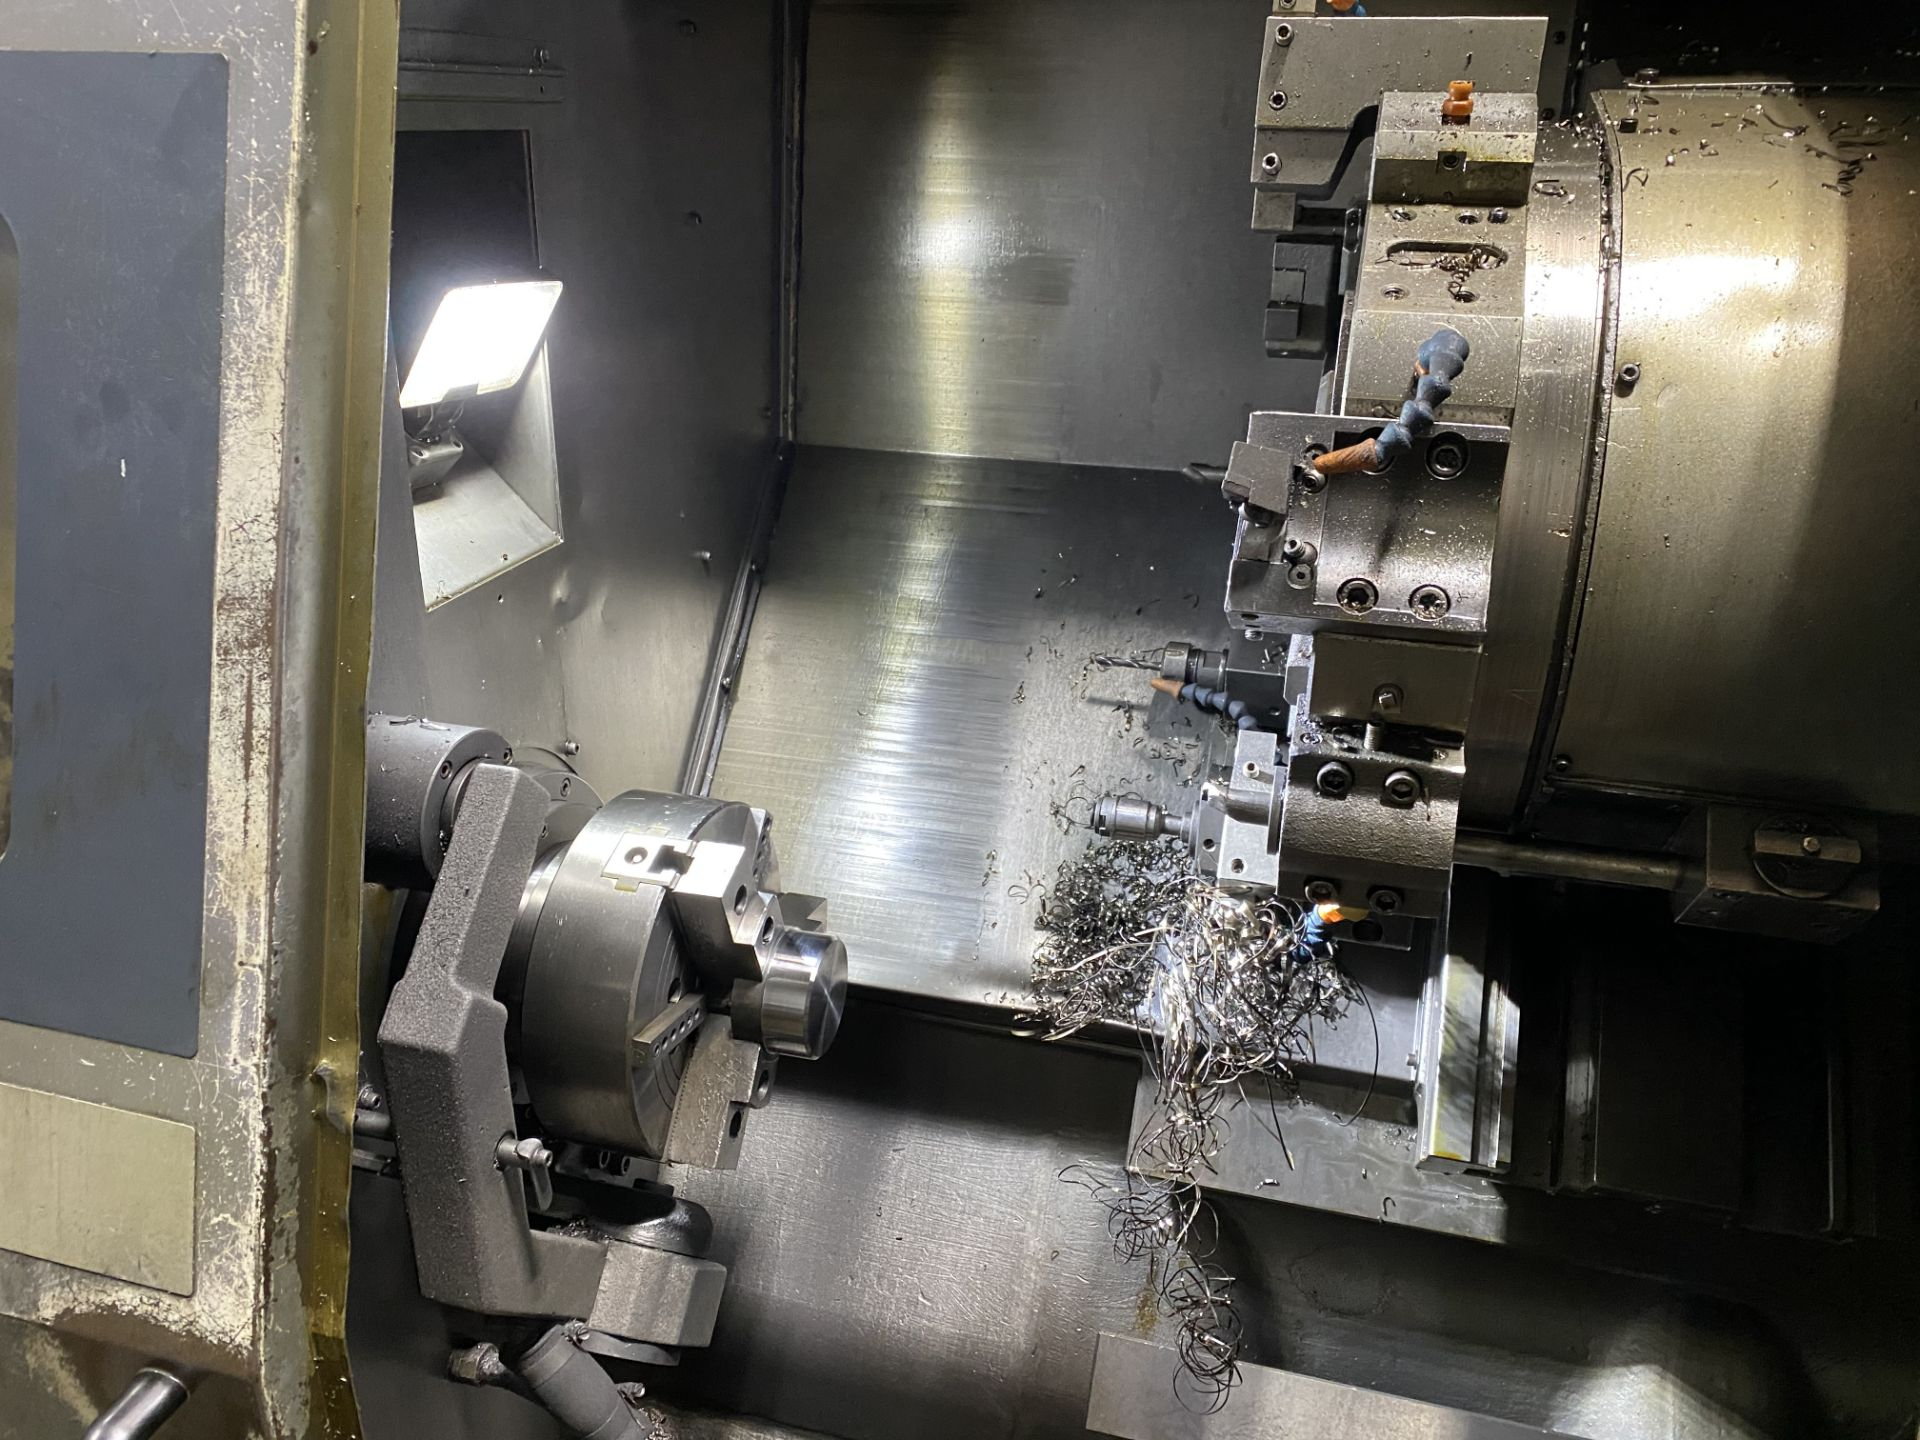 Mori Seiki SL-25M5 CNC Lathe - Image 3 of 8